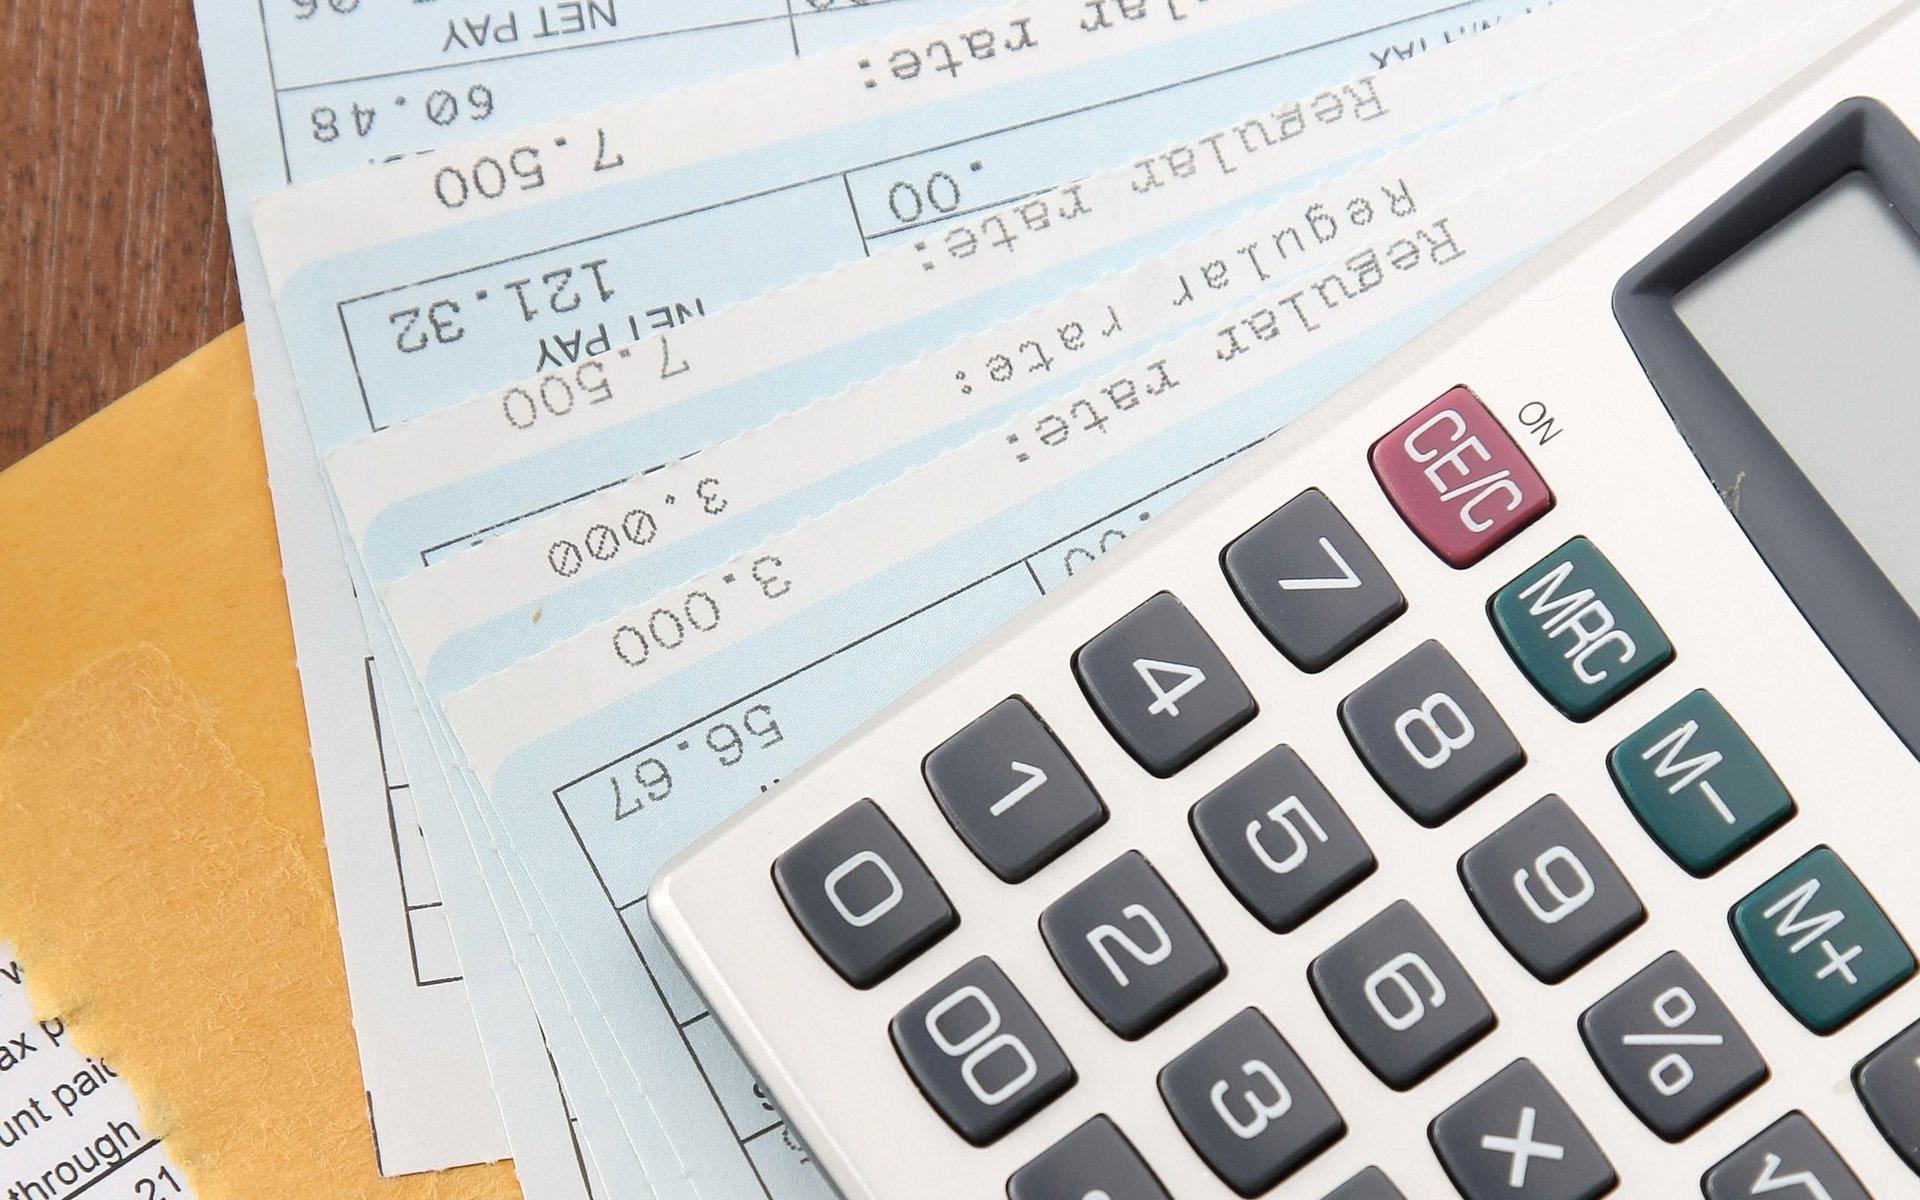 Payroll and a calculator